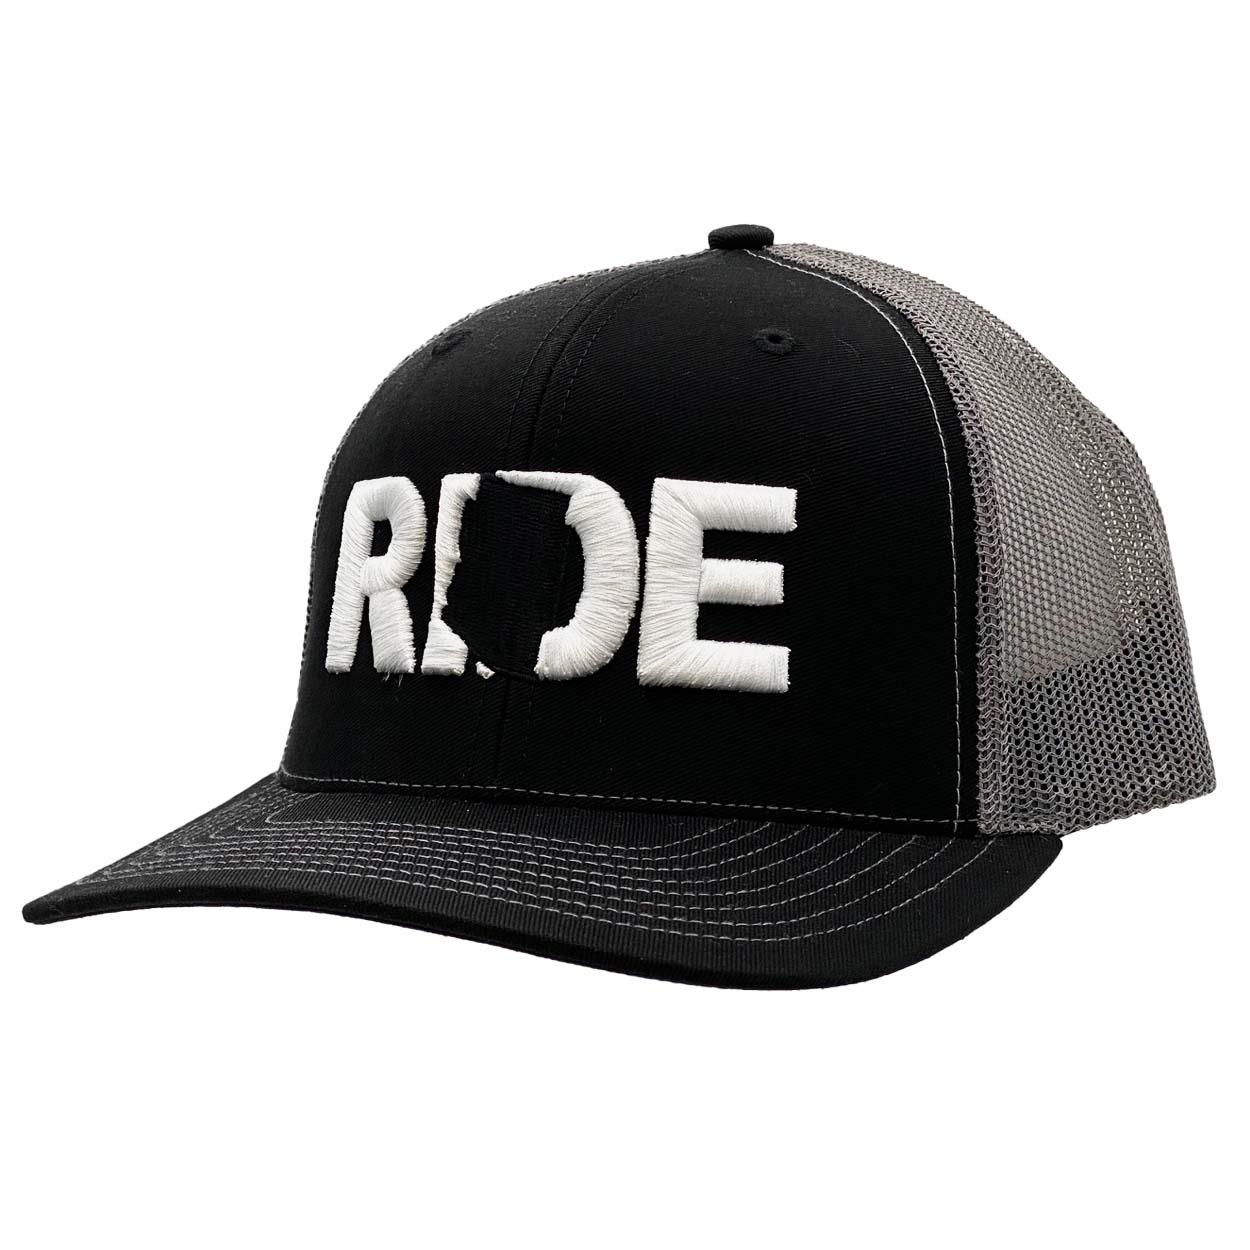 Ride Arizona Classic Embroidered Snapback Trucker Hat Black/White